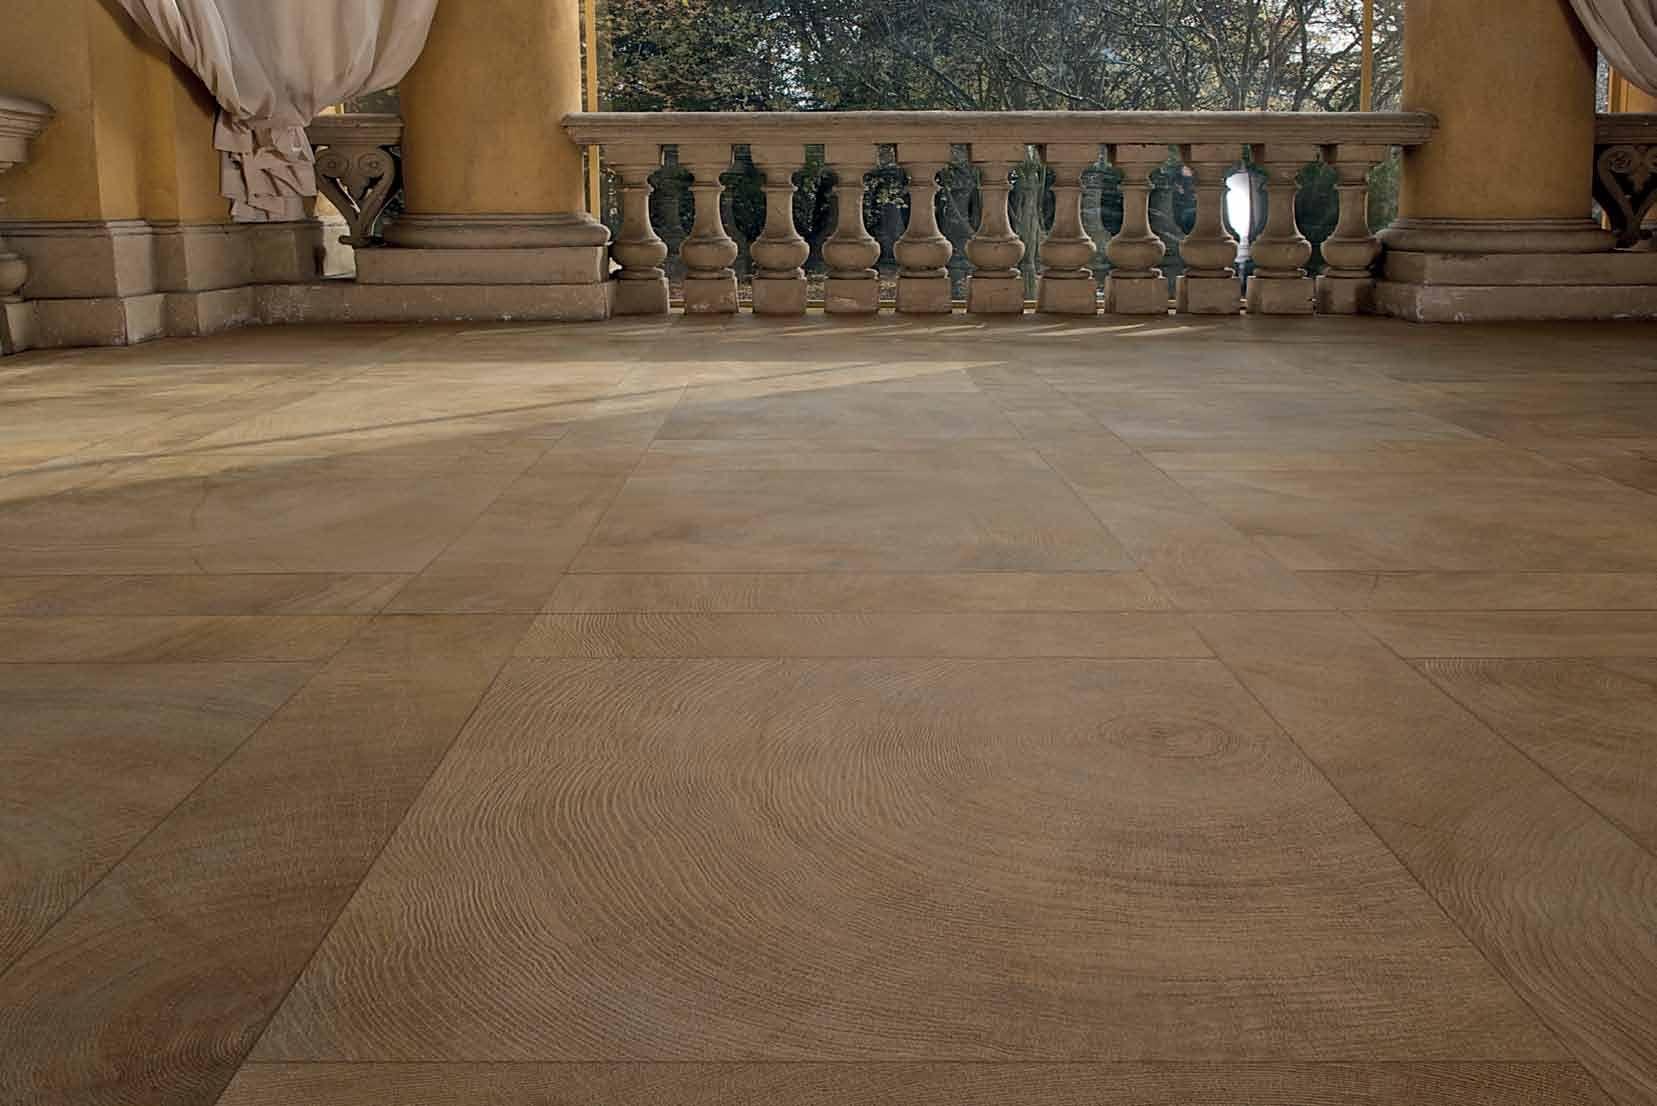 #Provenza #W-age Heartwood Lucidato 15x90 cm 91653P   #Porcelain stoneware #Wood #15x90   on #bathroom39.com at 49 Euro/sqm   #tiles #ceramic #floor #bathroom #kitchen #outdoor